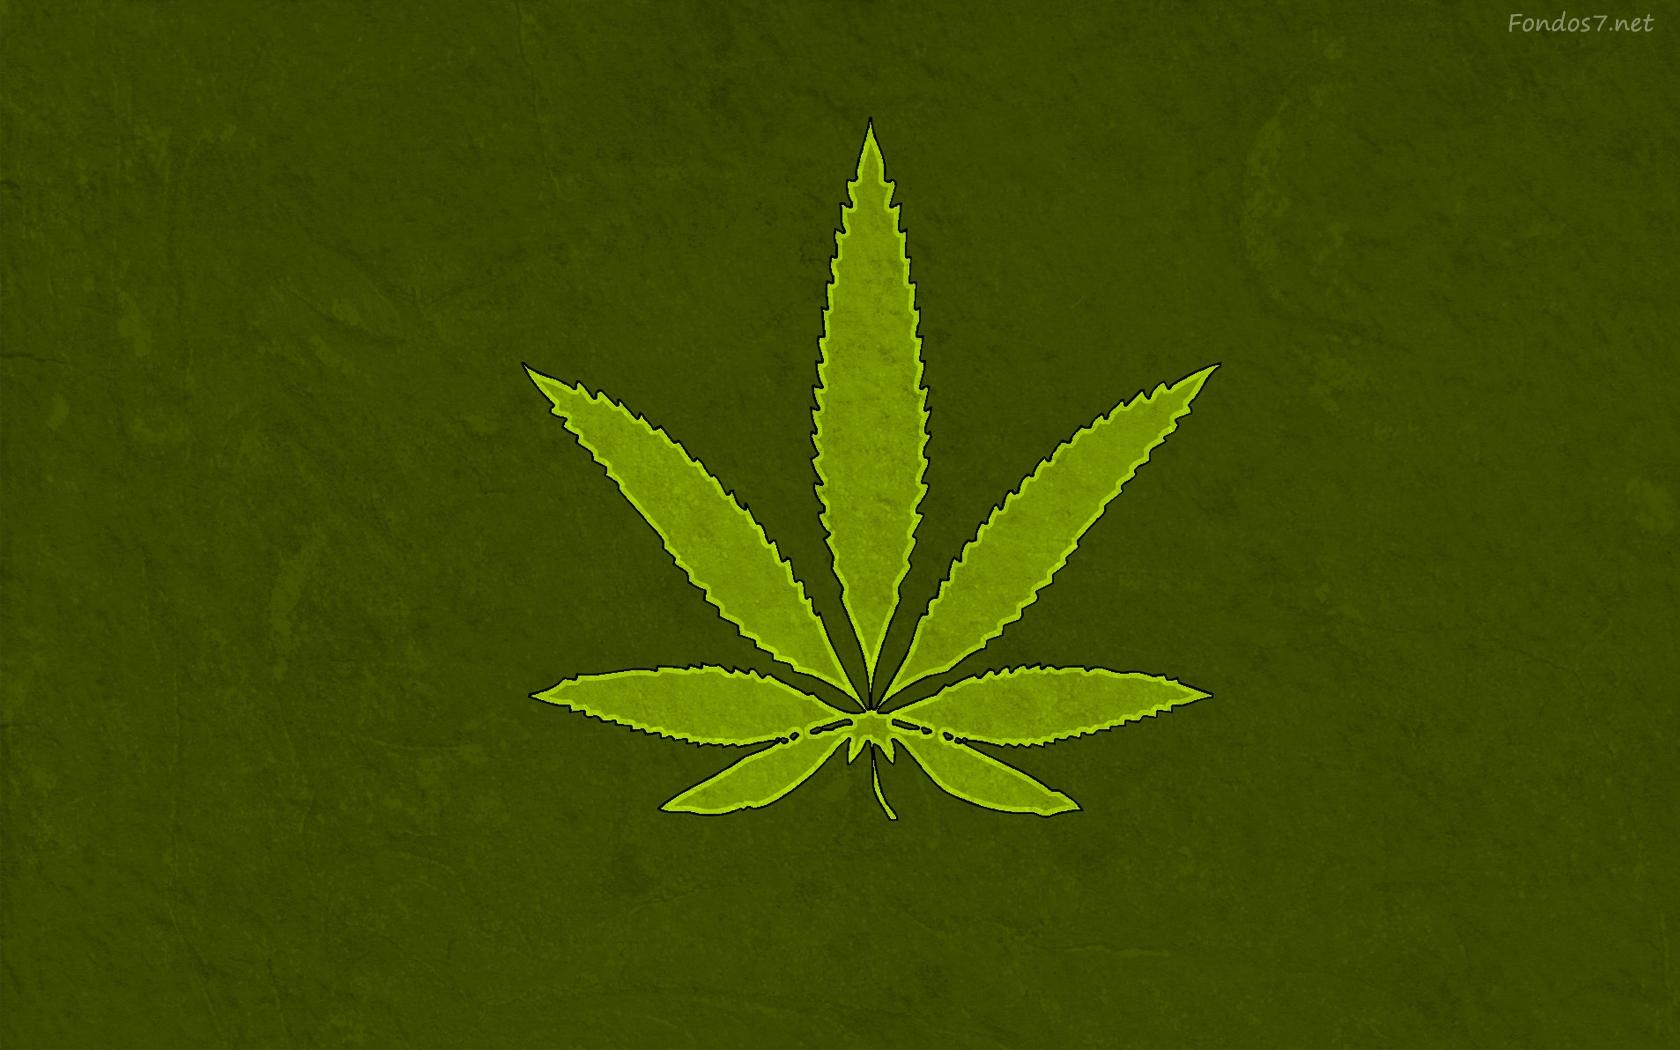 Descargar Fondos De Pantalla Hoja De Marihuana Hd